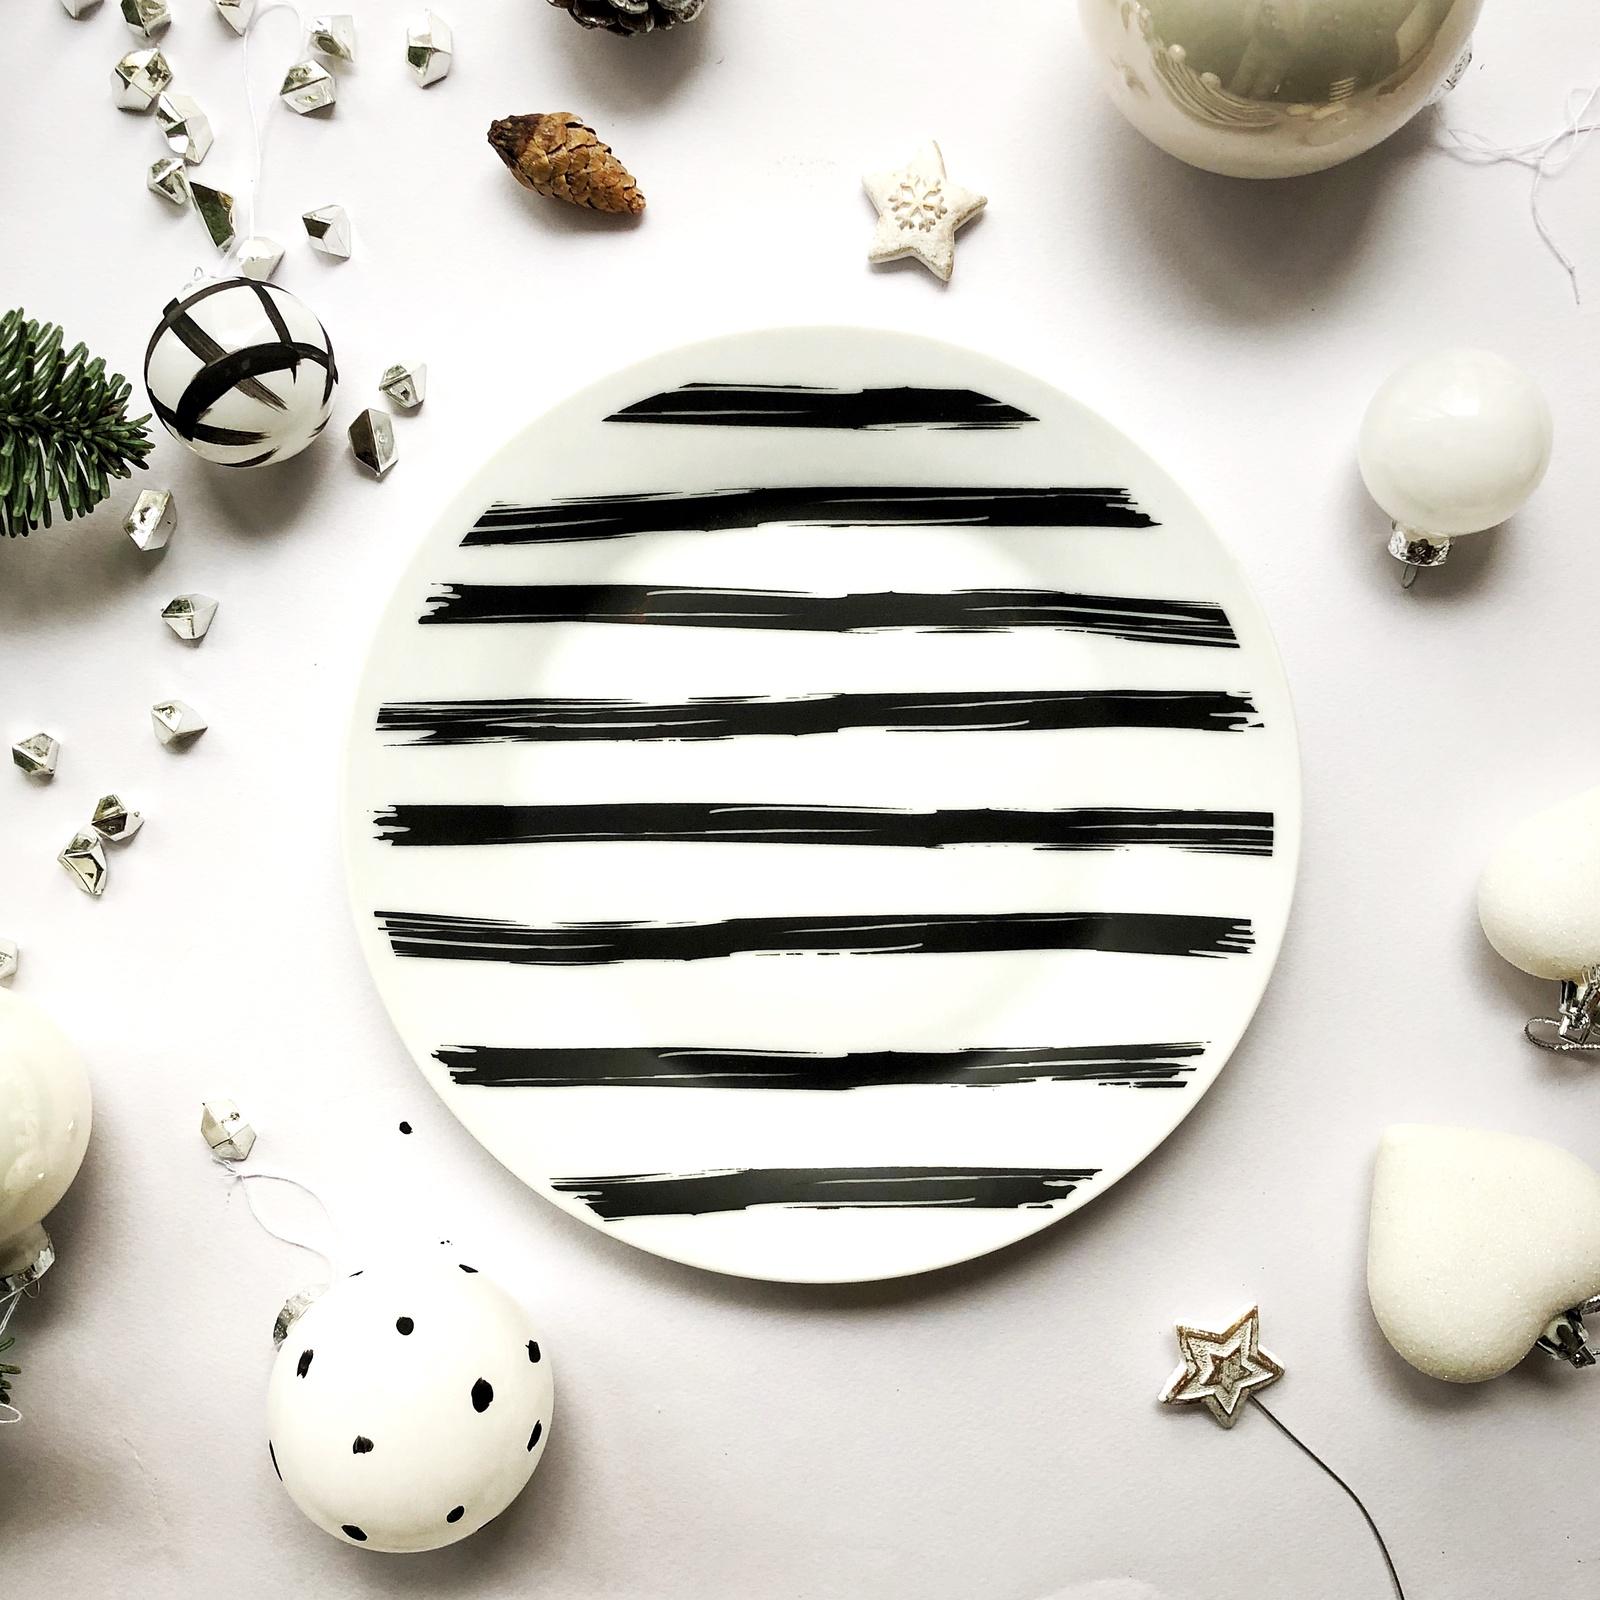 Тарелка Сотвори Чудо Линия 20 см, белый тарелка мелкая сотвори чудо бантик sans brides диаметр 20 см